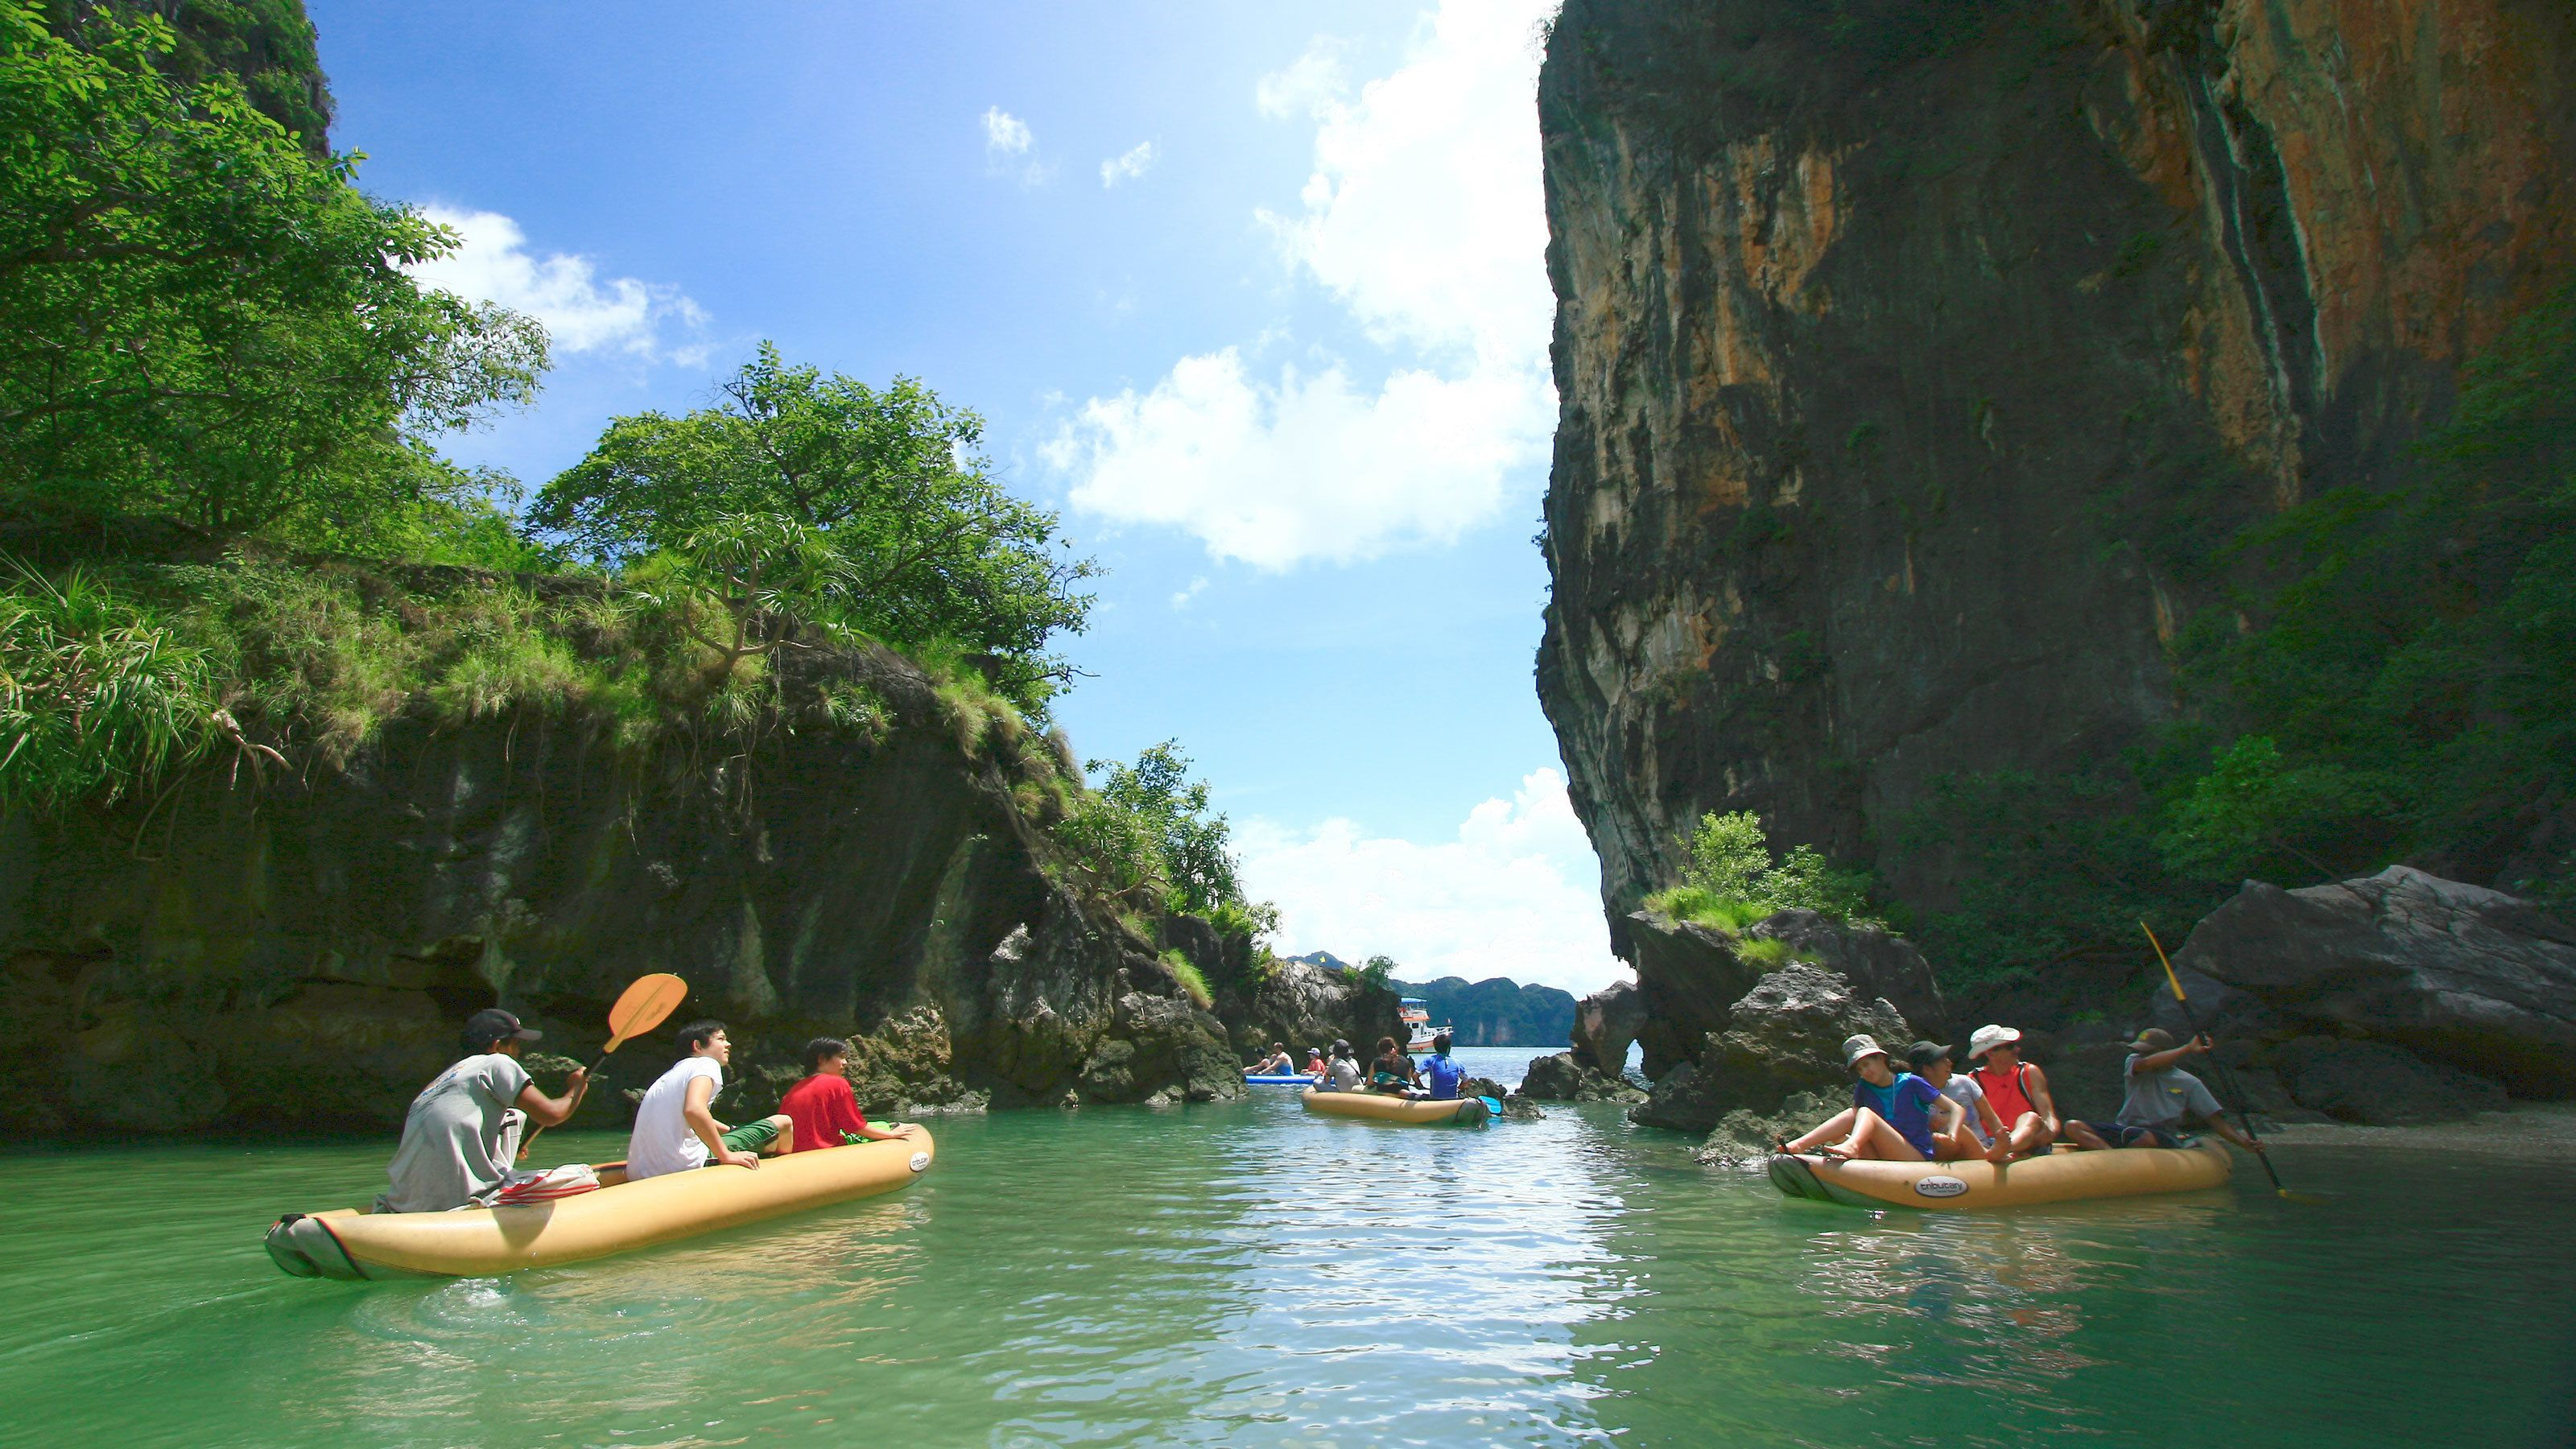 kayaking near the islands of Phuket